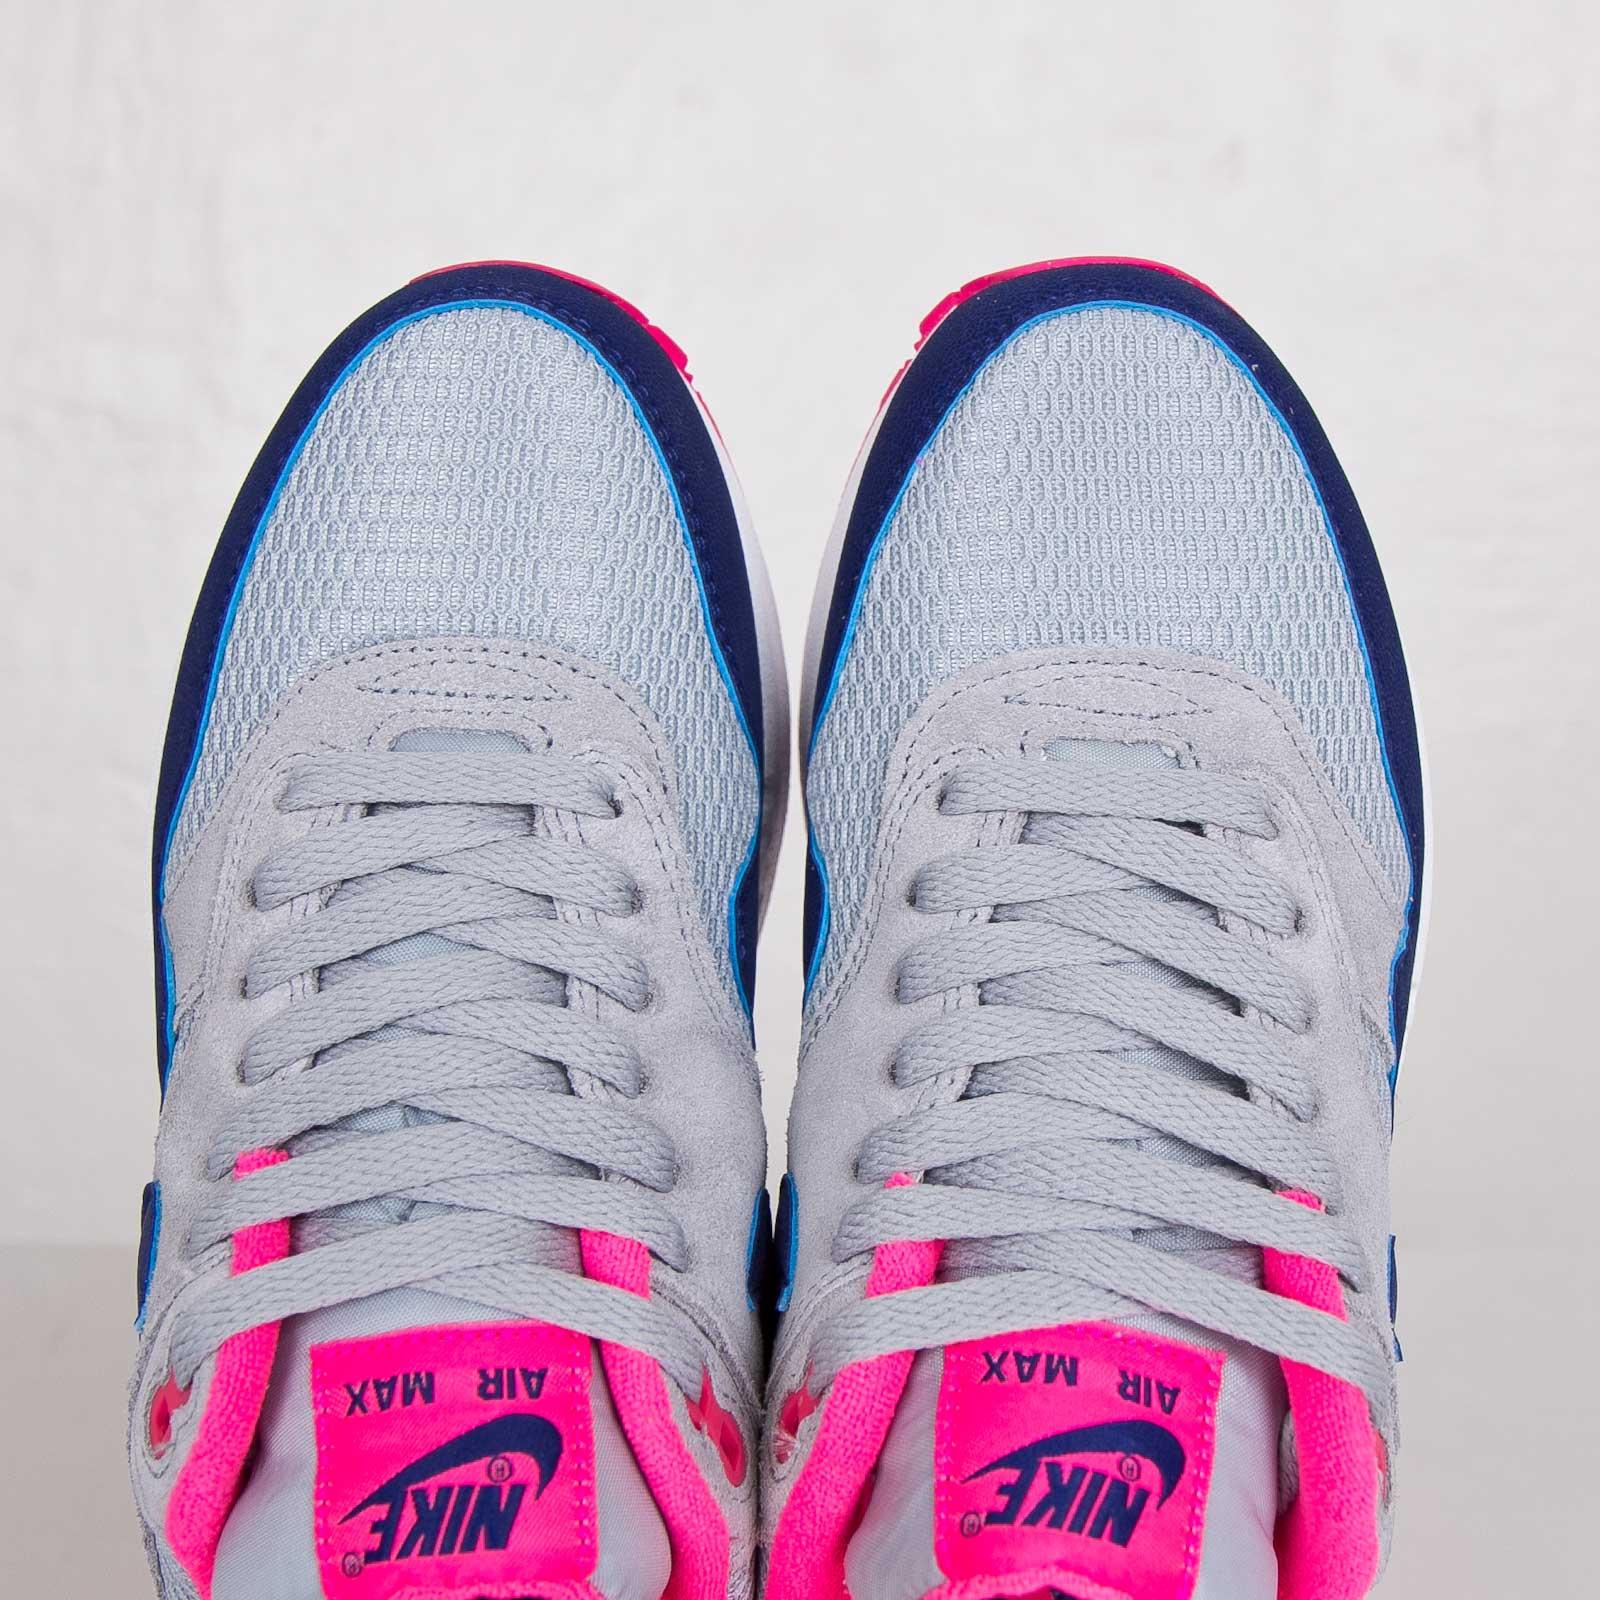 Nike Sportswear Womens Air Max 1 Essential Light Magnet GreyDeep Royal BlueHyper Pink